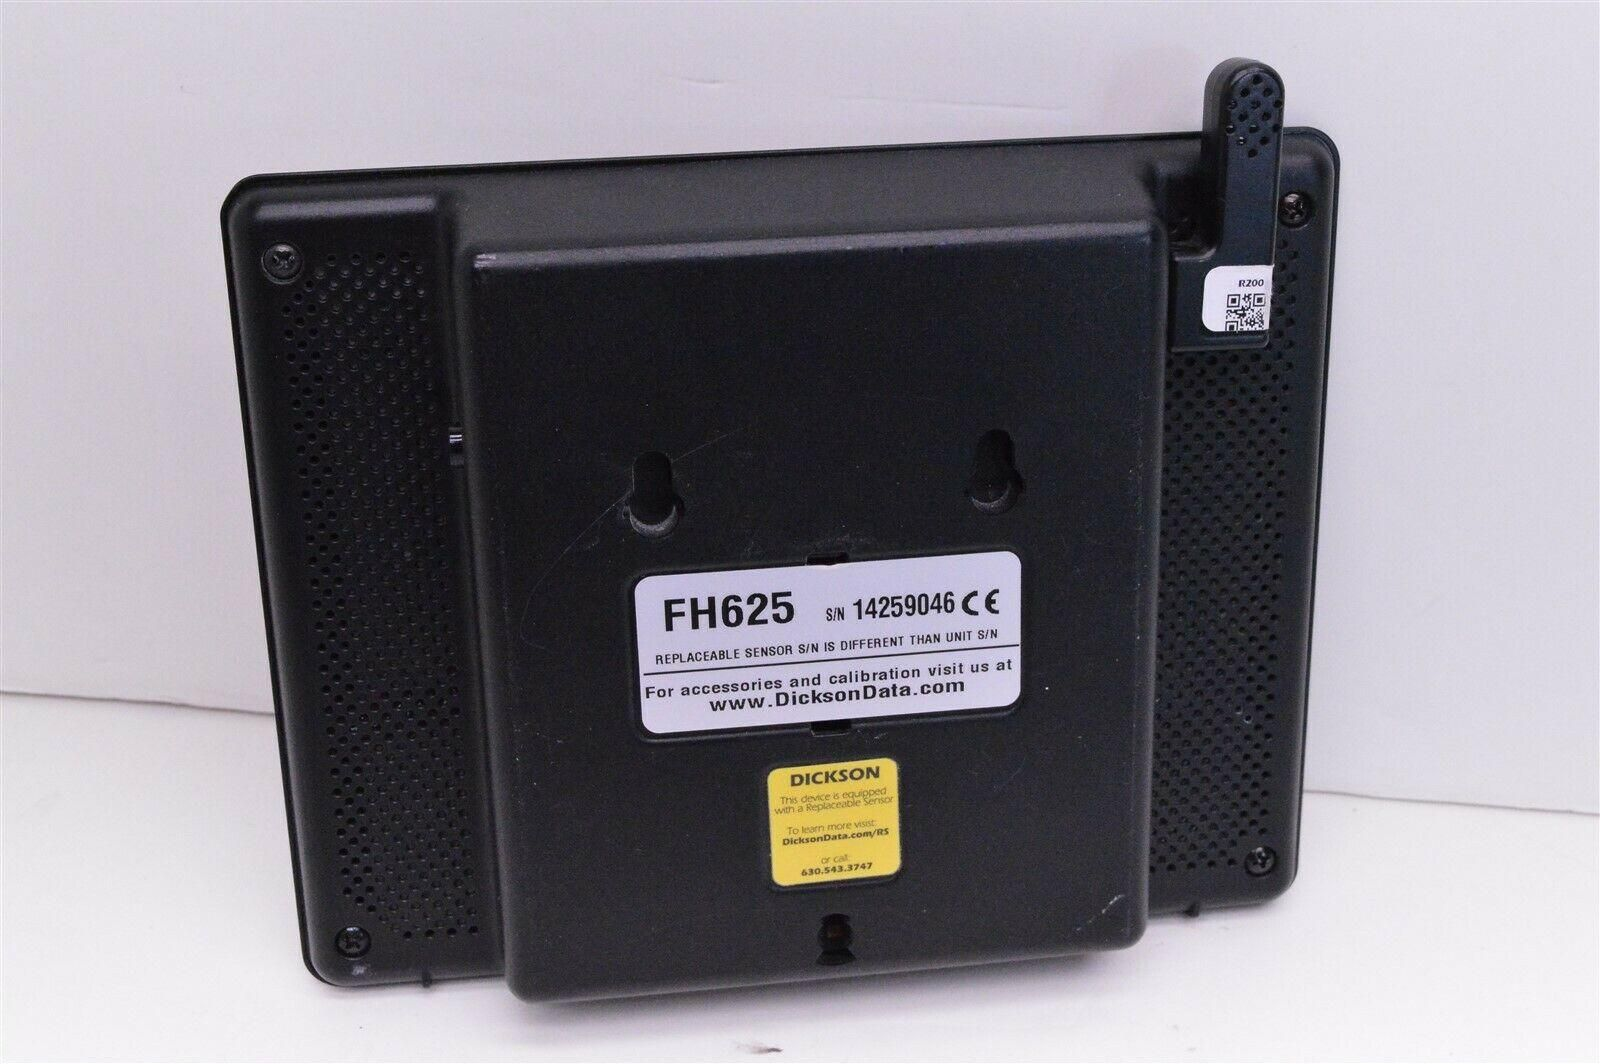 Dickson data FH625 digital touchscreen temperature chart recorder w/probe BAD